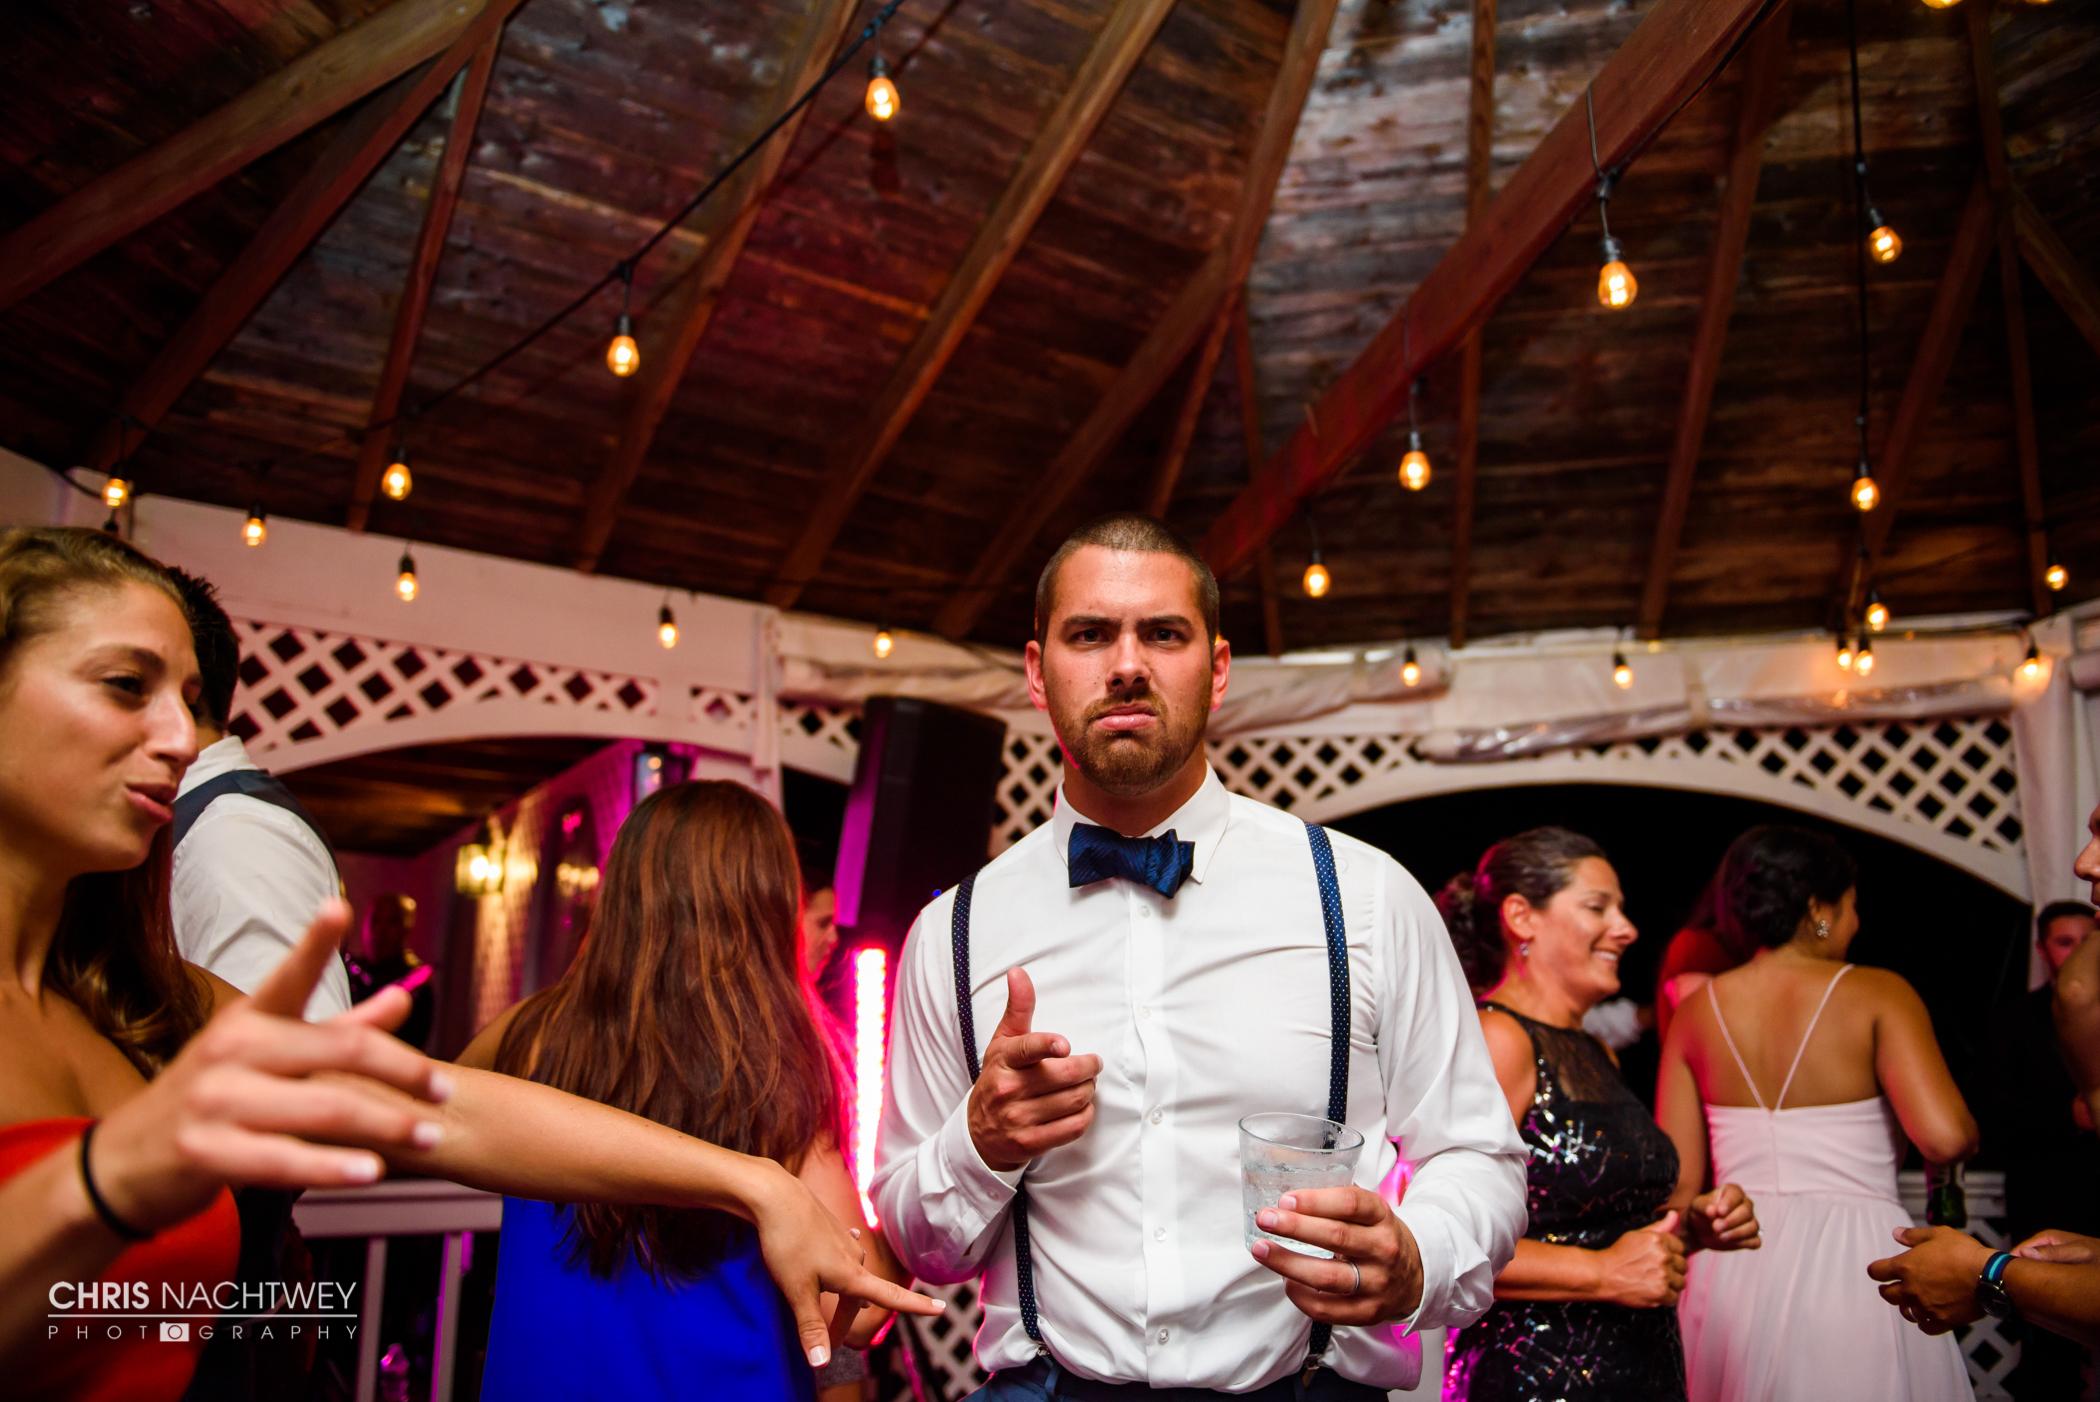 inn-at-mystic-connecticut-wedding-photographer-chris-nachtwey-39.jpg